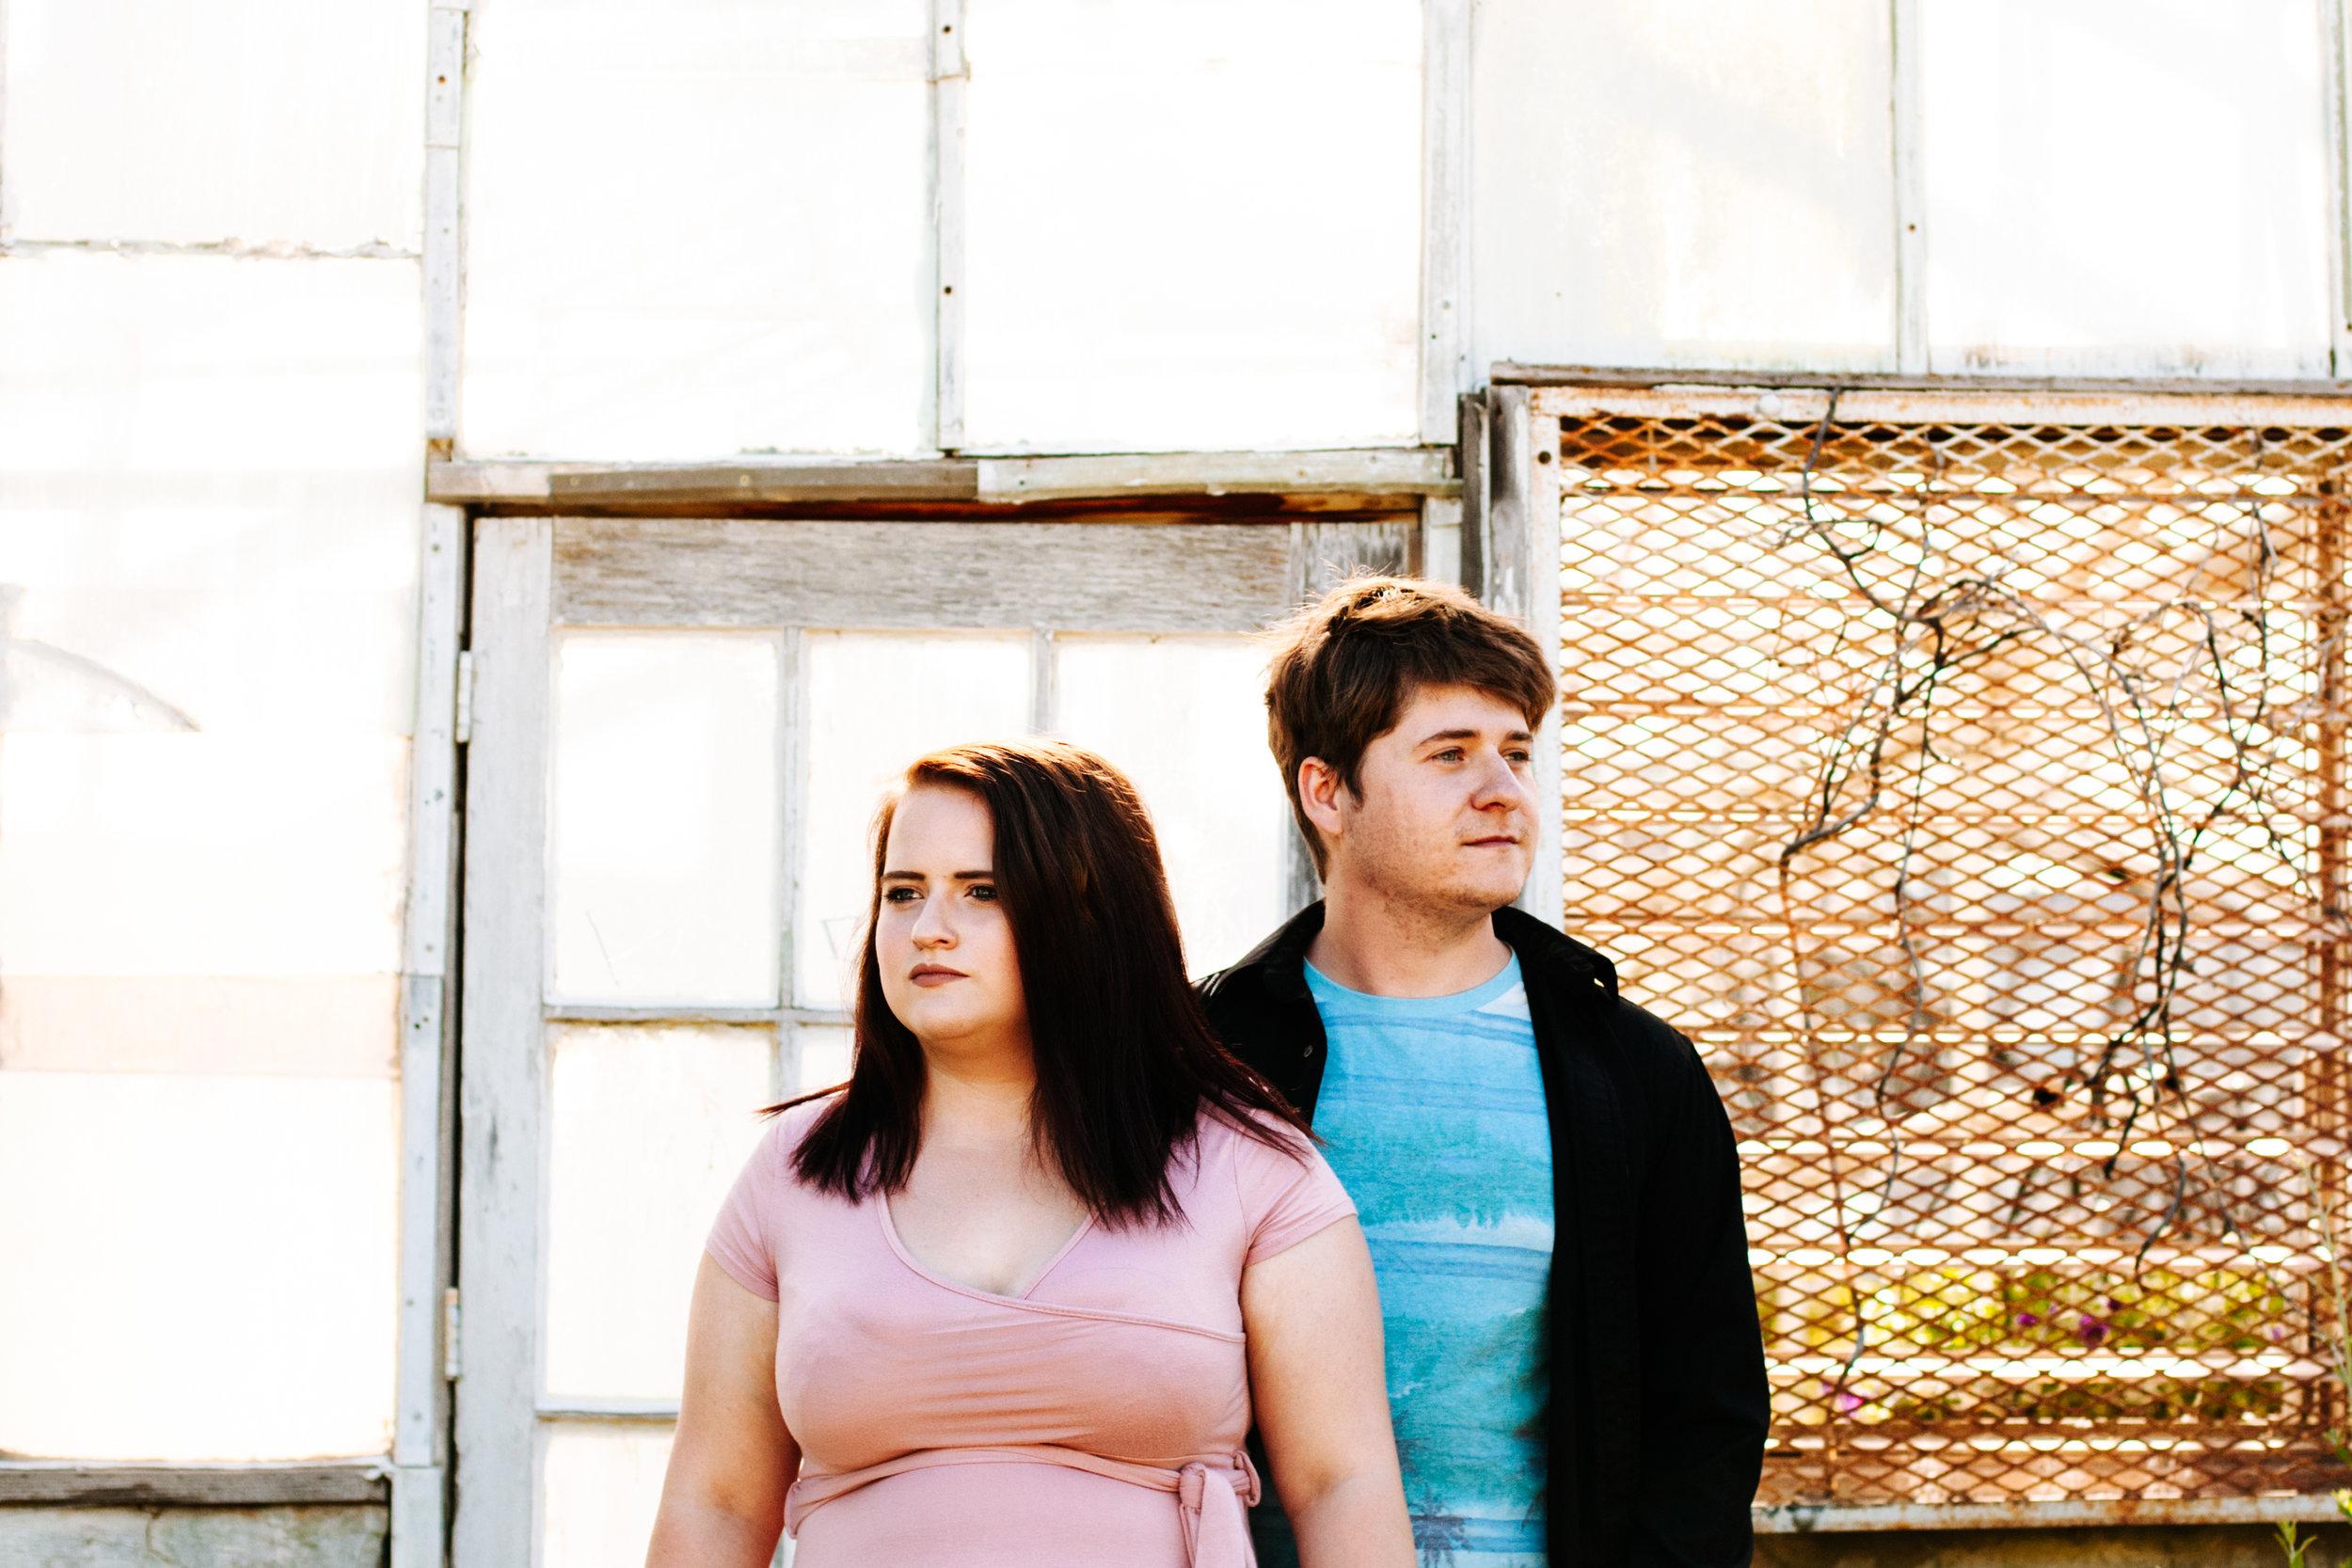 +Liberty Park +Utah Engagement Session +Salt Lake City Engagement Photographer +Utah Wedding Photographer +Marina Rey Photo-9168.jpg